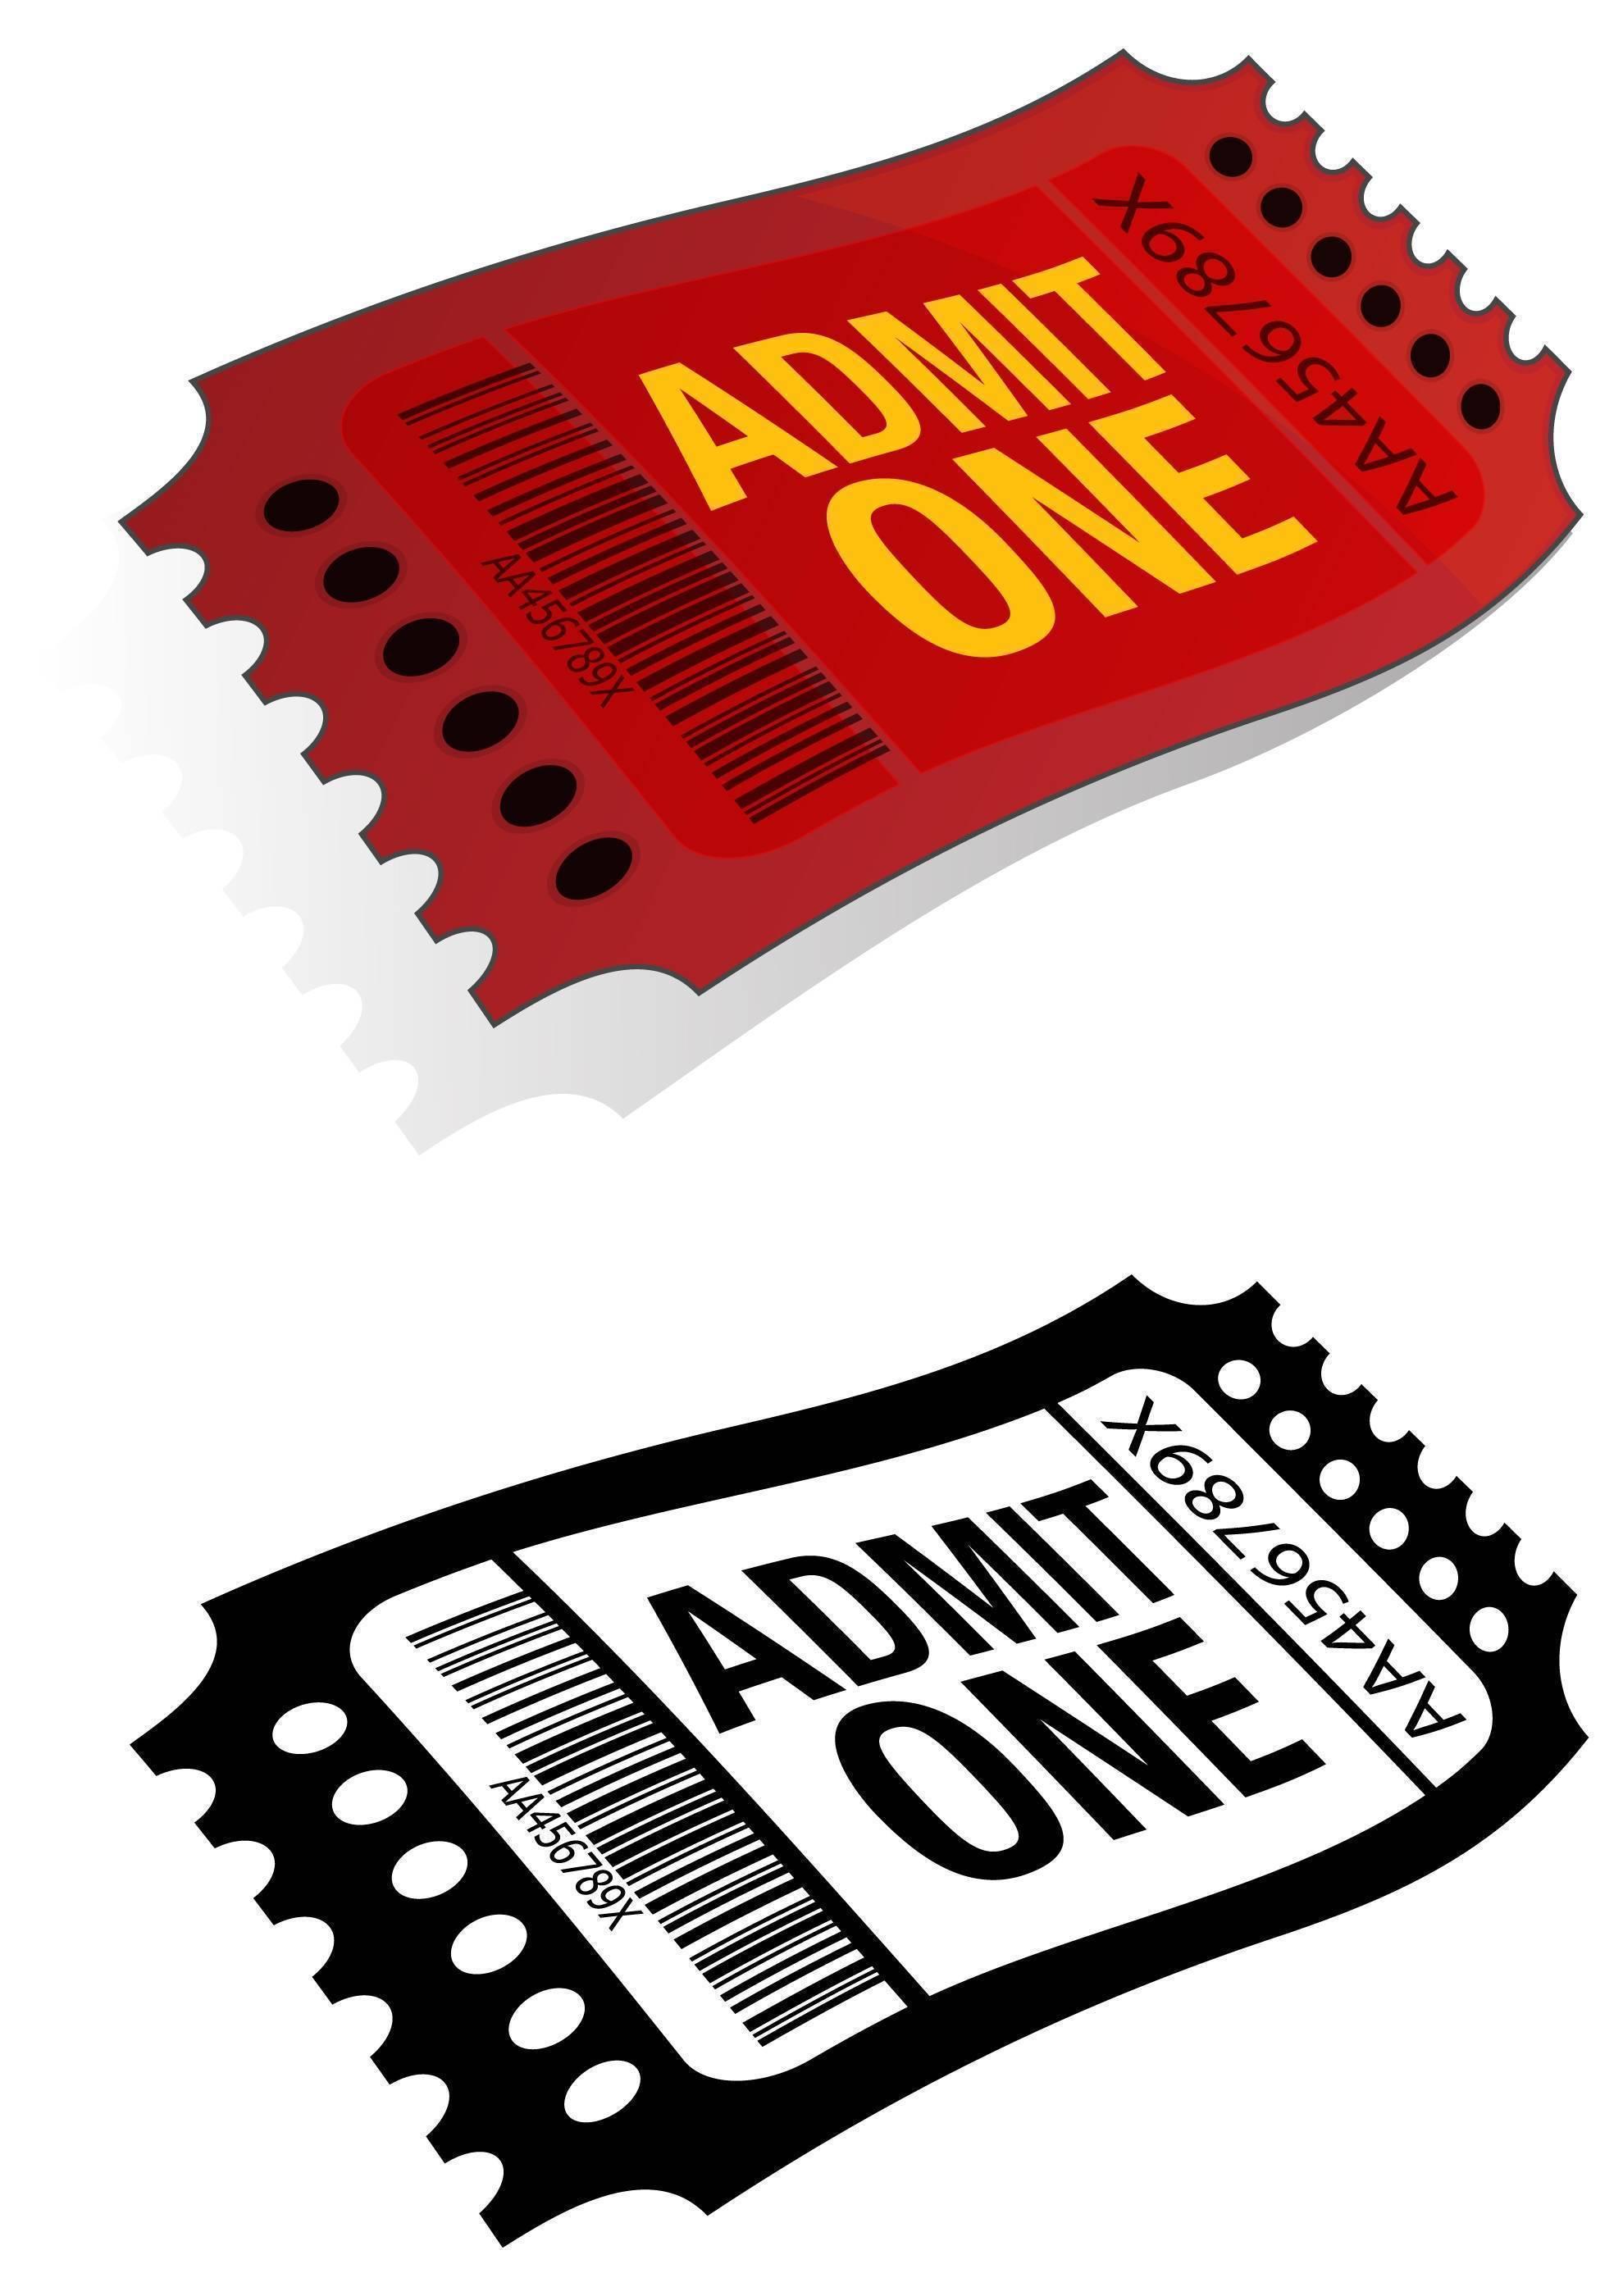 Pre-Sale Tickets Available For February's Designer Bag Bingo